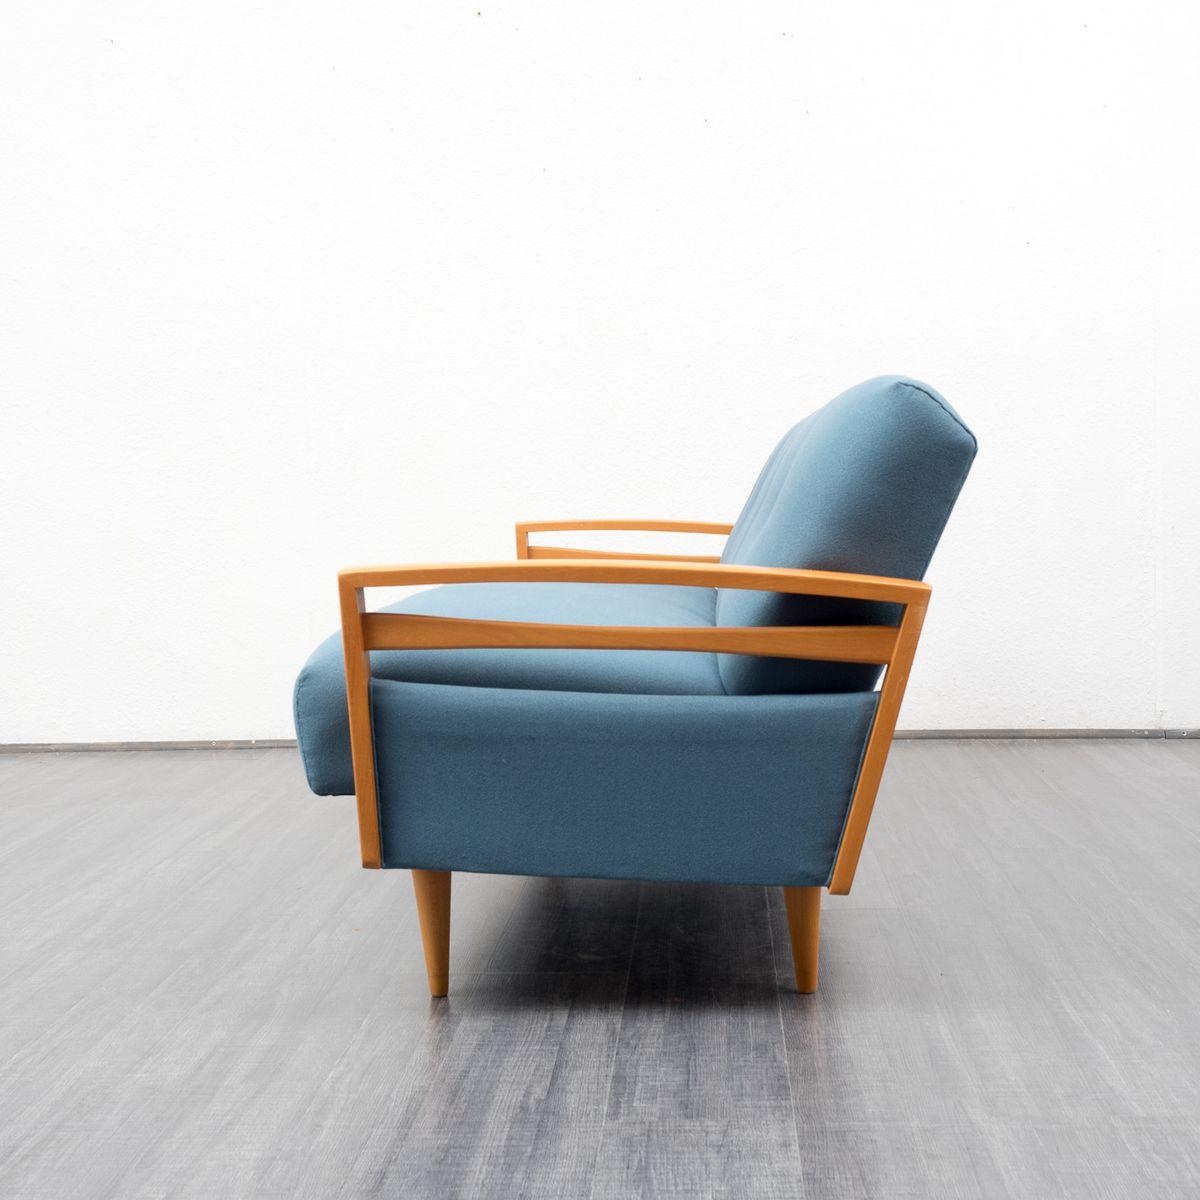 buchenholz schlafsofa 1960er bei pamono kaufen. Black Bedroom Furniture Sets. Home Design Ideas